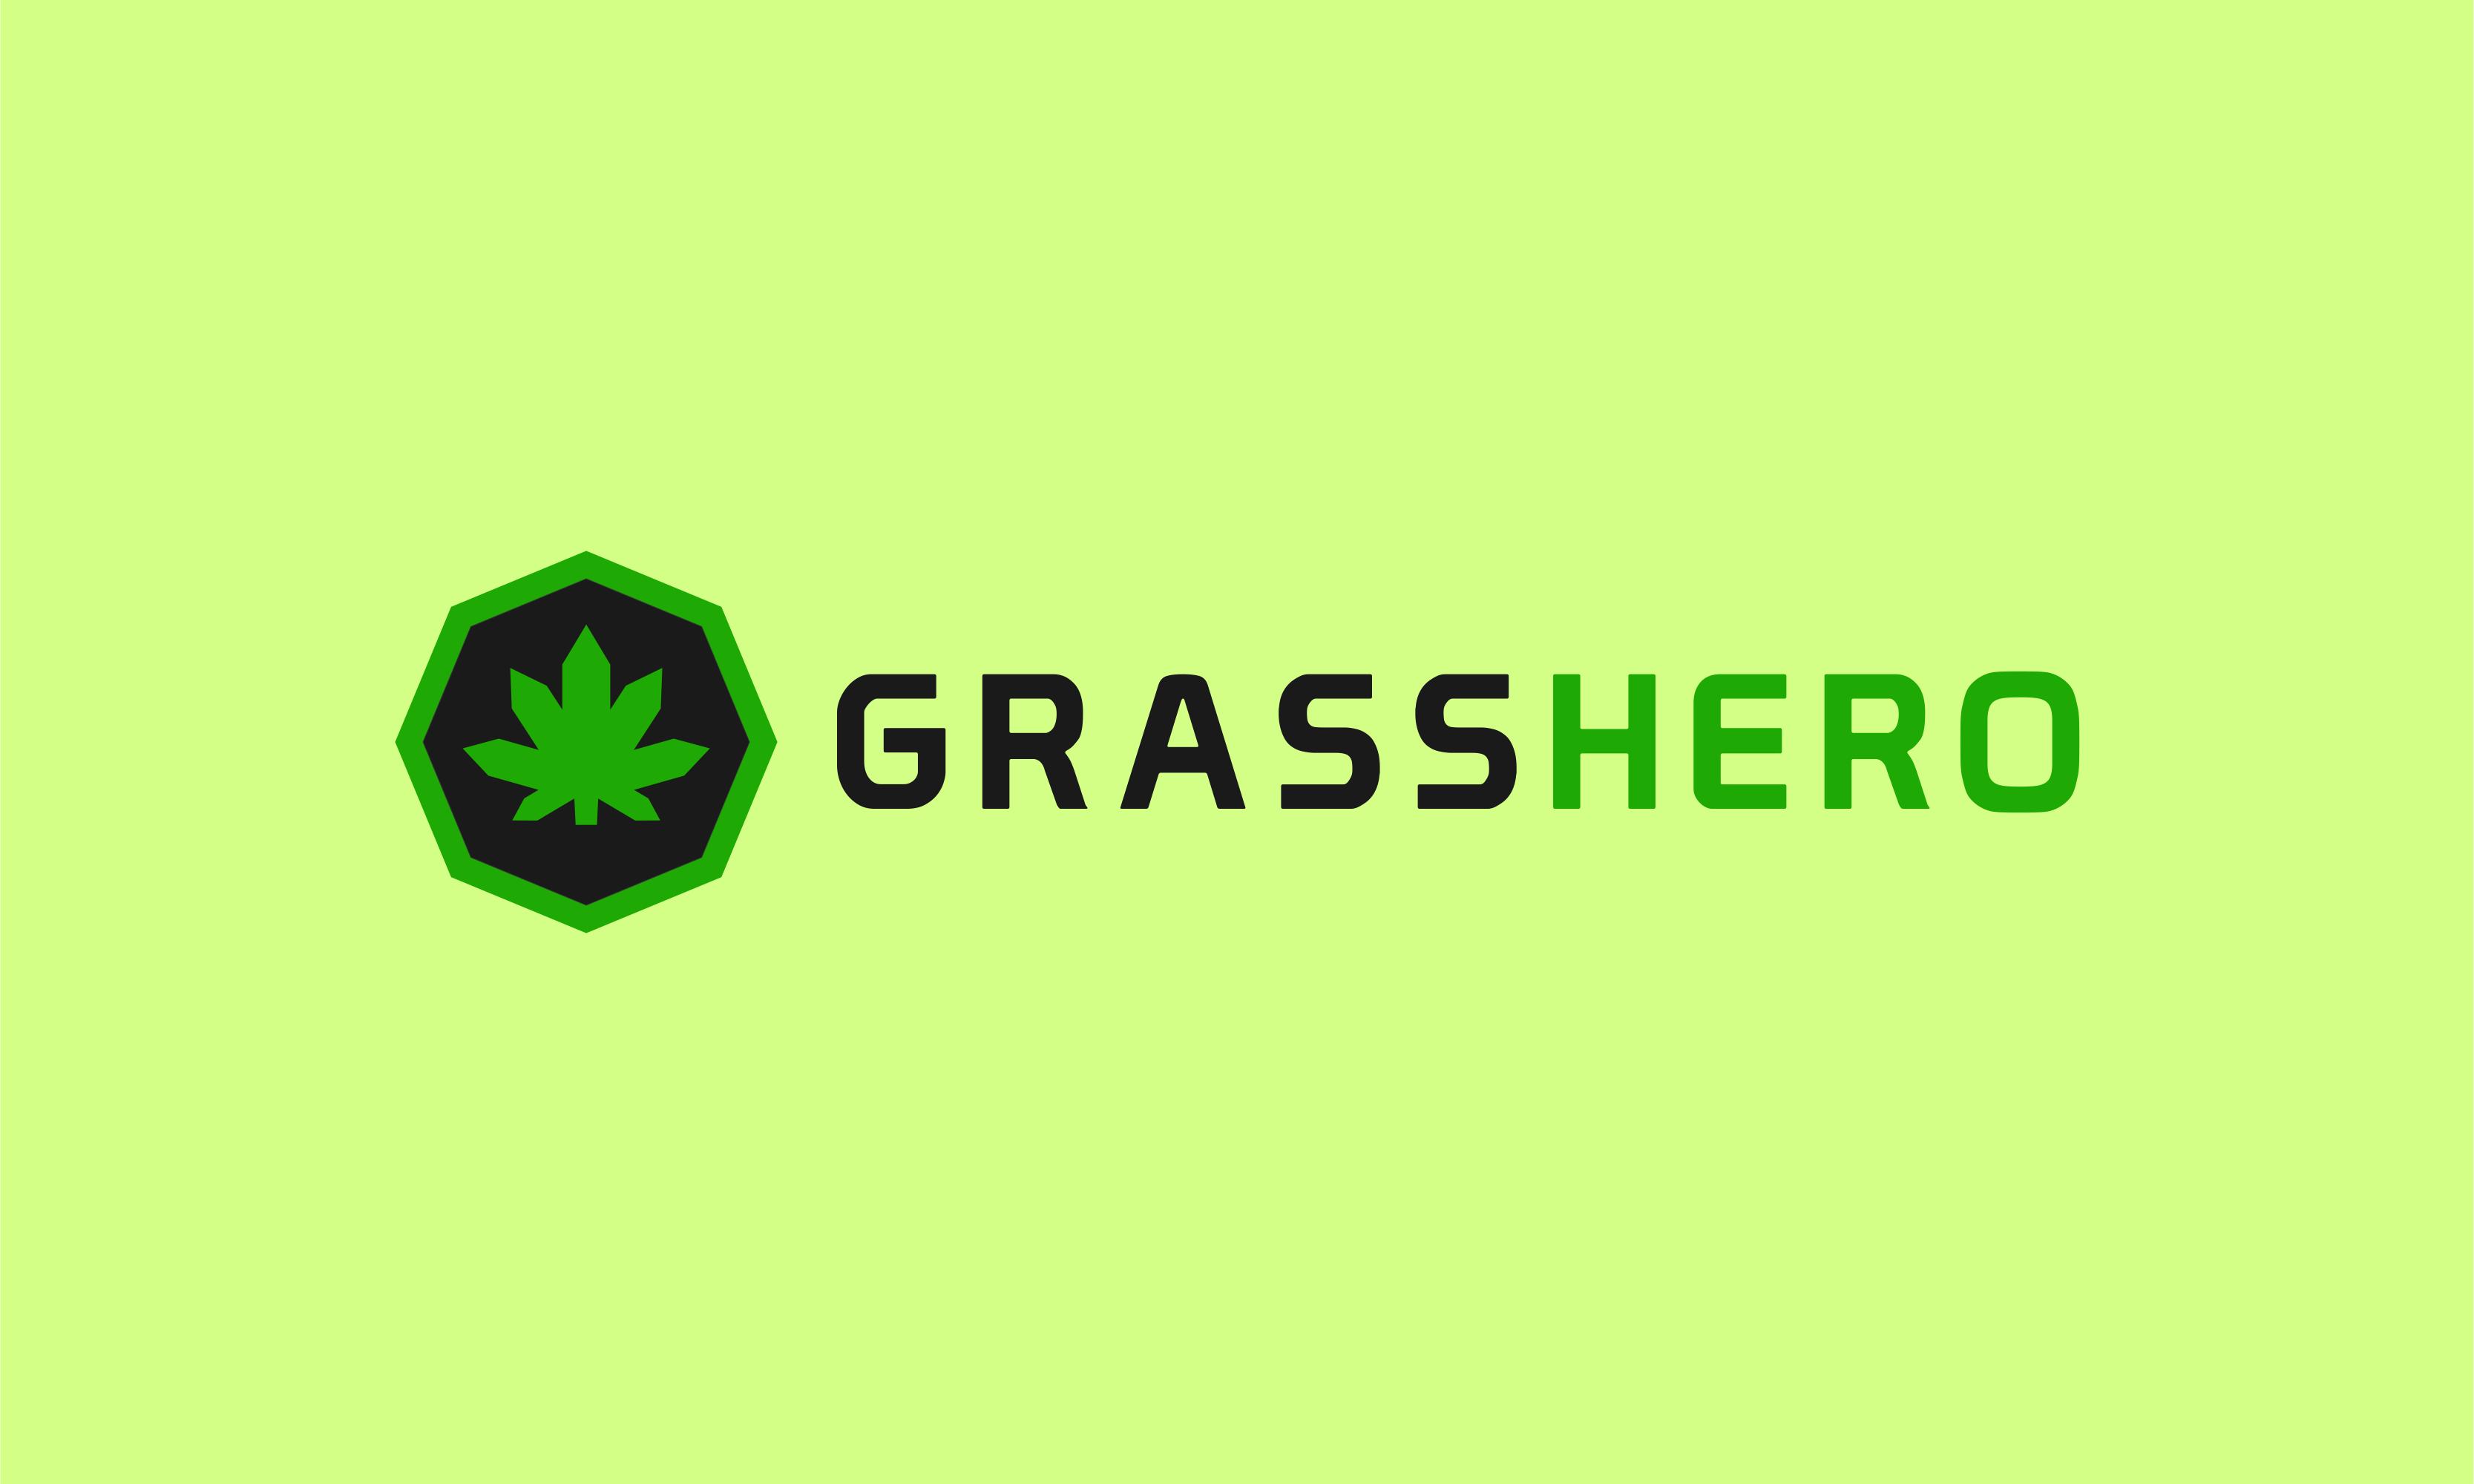 Grasshero